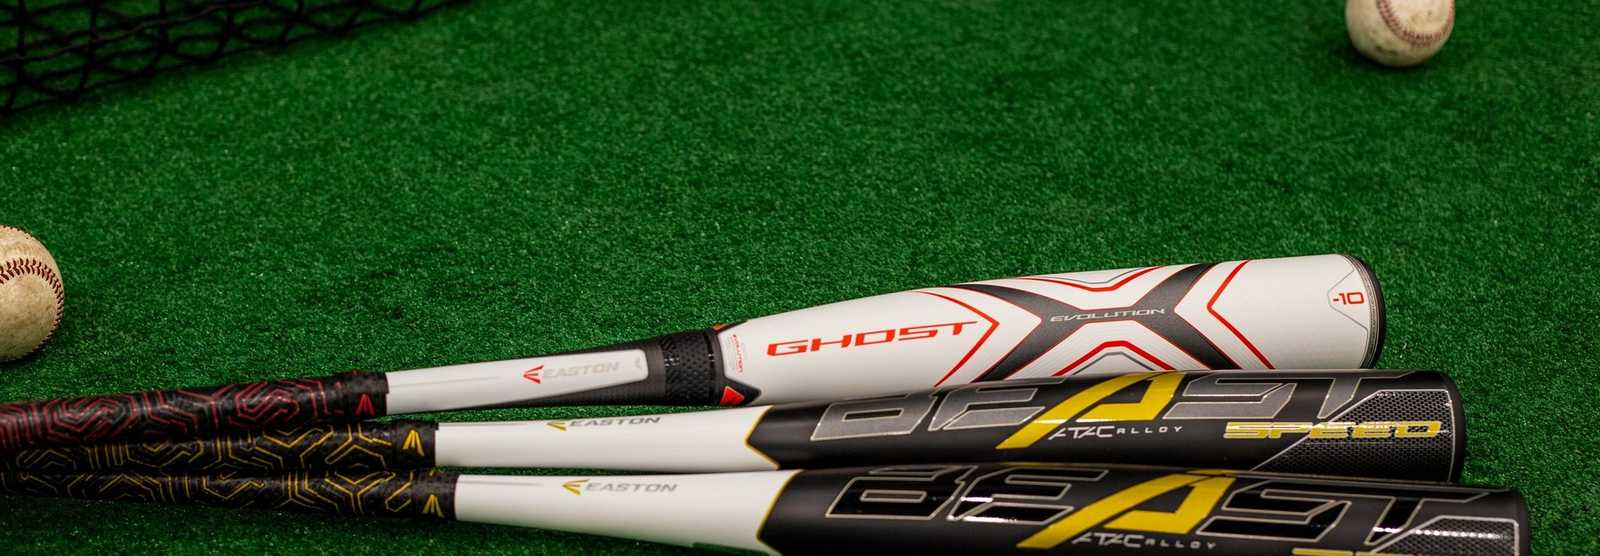 usssa-2018-2019-baseball-bats-pre-order